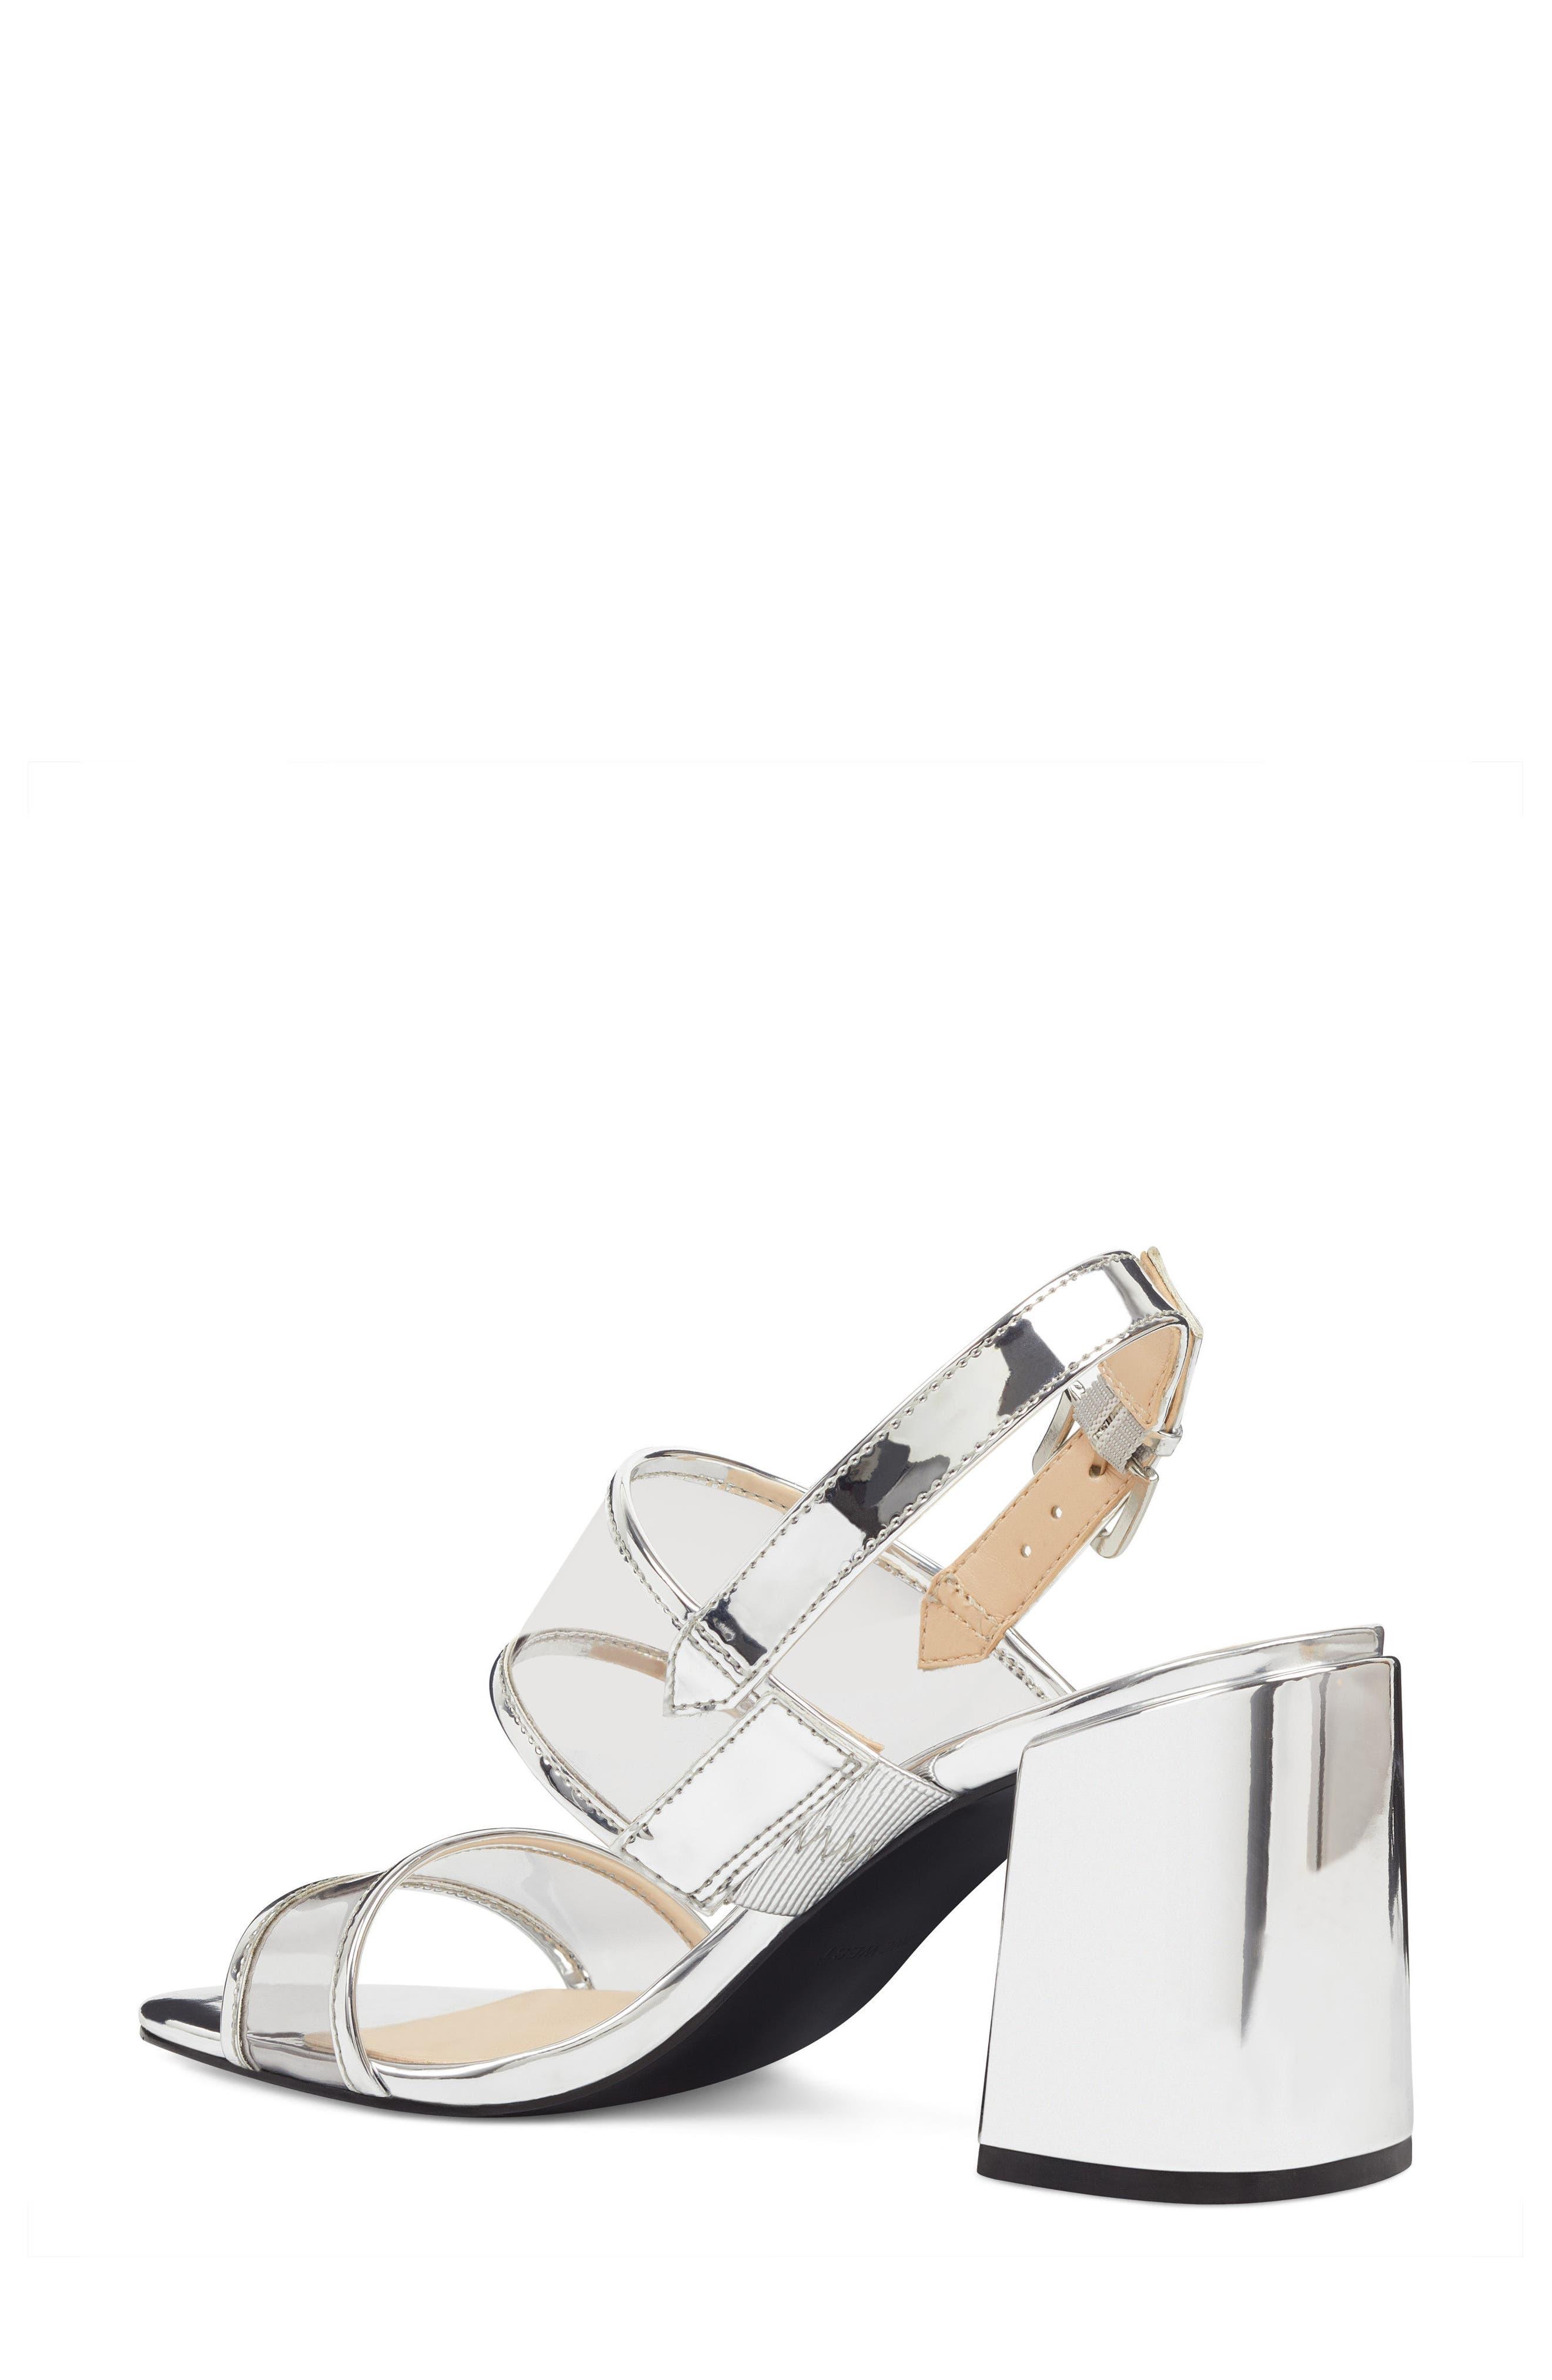 Gourdes Block Heel Sandal,                             Alternate thumbnail 2, color,                             021